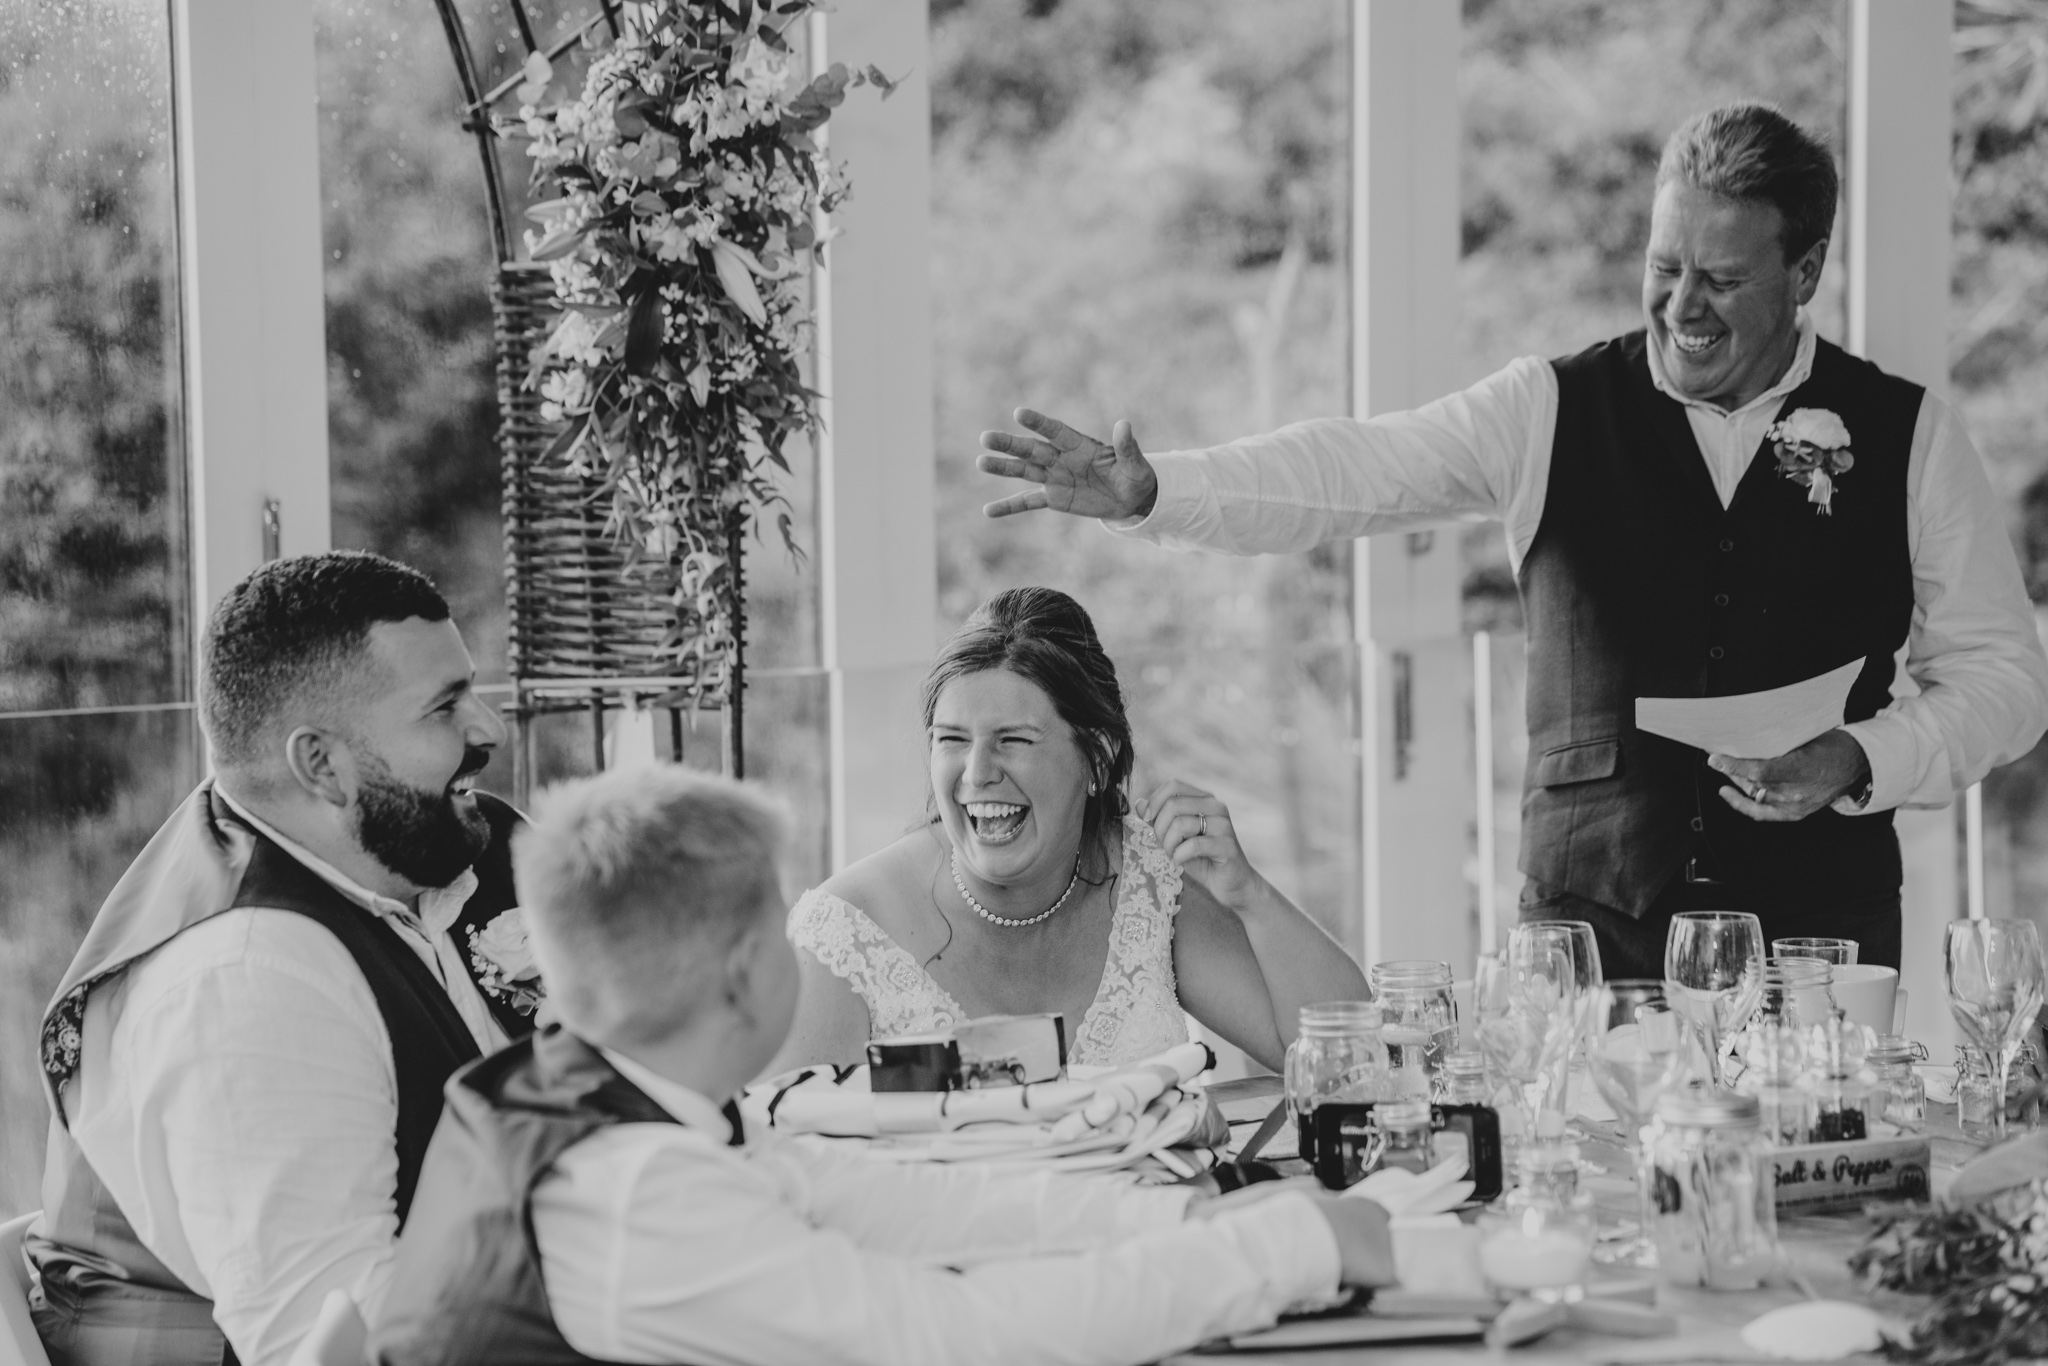 john-amy-relaxed-beach-wedding-tunnels-beaches-ilfracombe-north-devon-grace-elizabeth-colchester-essex-alternative-relaxed-wedding-photography-devon-suffolk-norfolk-essex (115 of 159).jpg